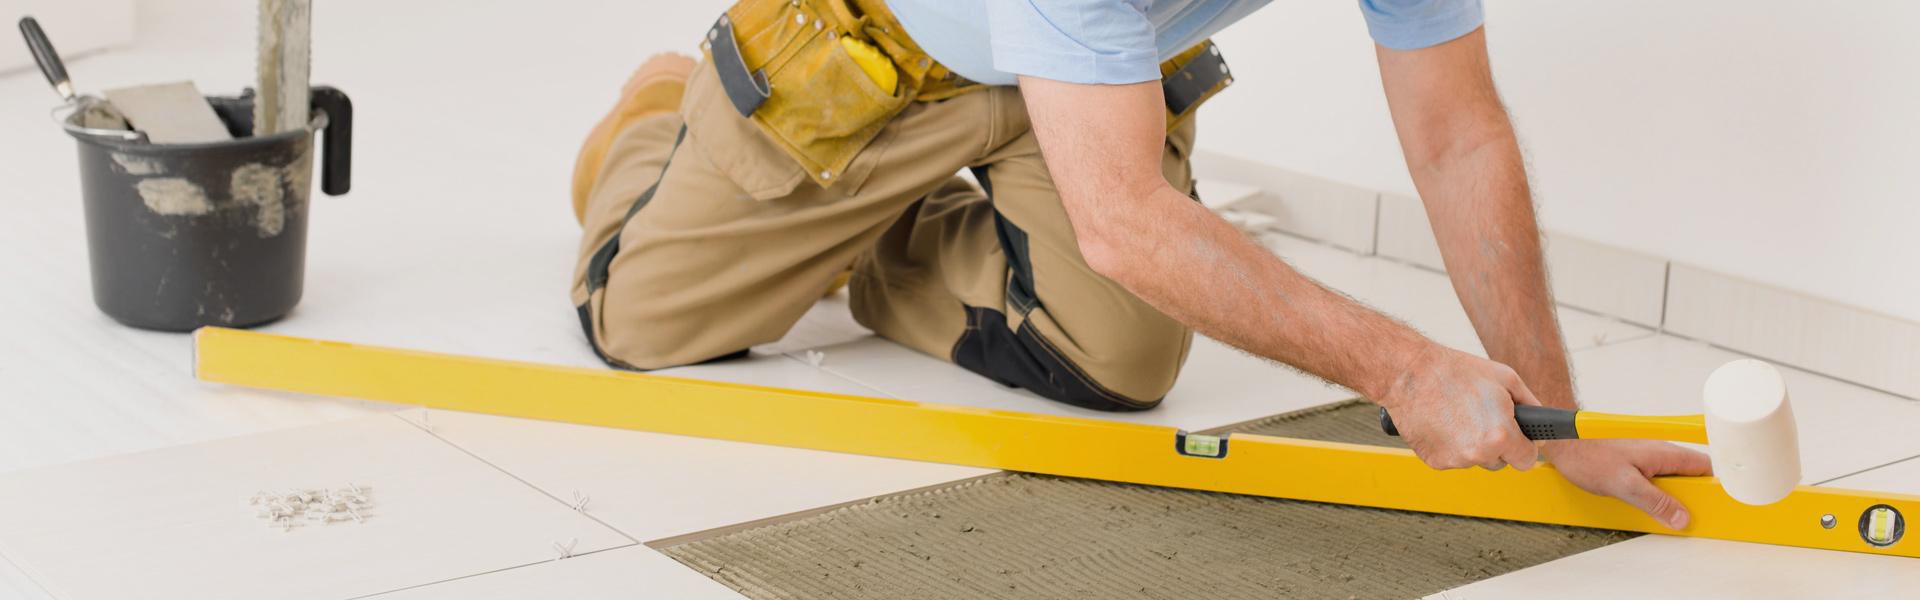 Professional Handyman Service Bangkok